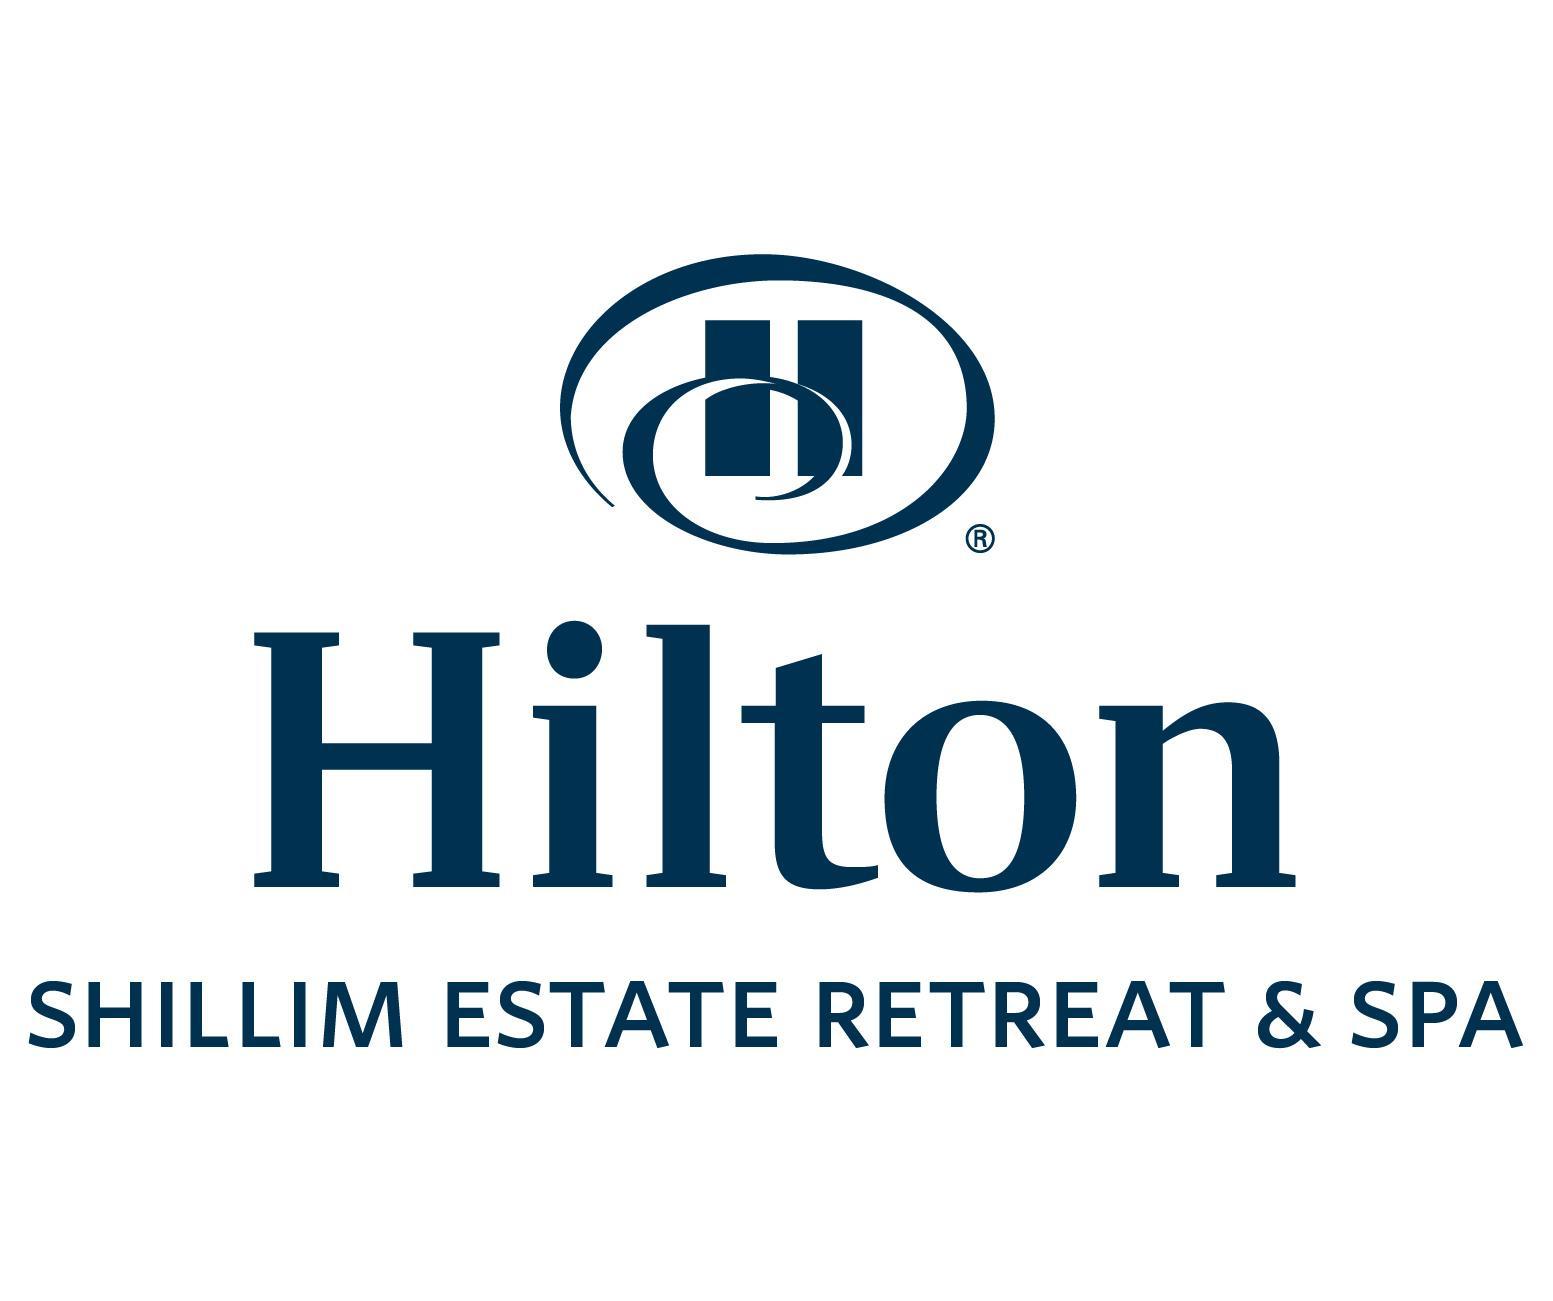 C:\Users\adawar\Desktop\ANKITA\HOTELS\Shillim\Logo\jpg\Hilton_SHILIM_ESTSPA_color_rgb.jpg